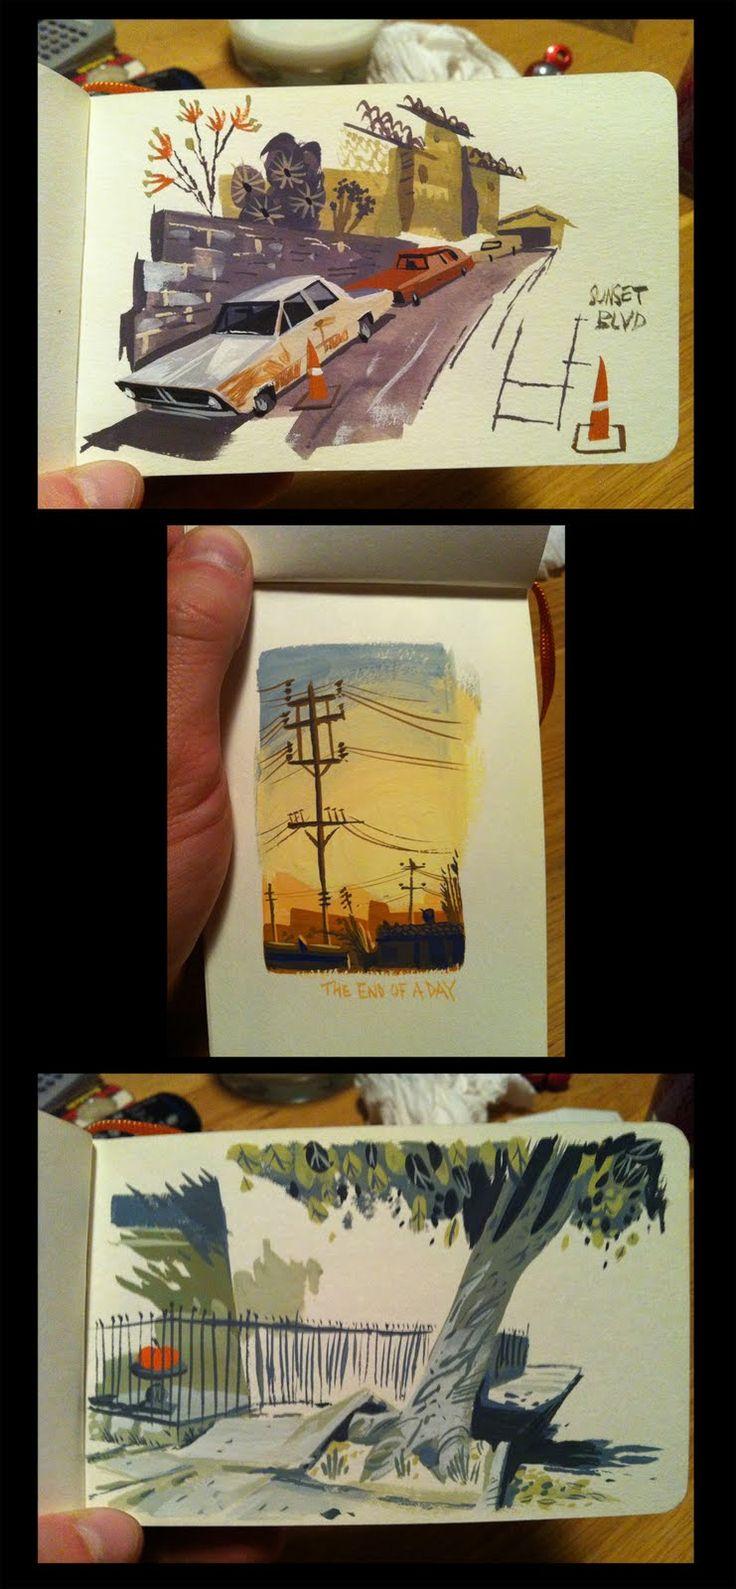 Sketchbook. Art journal. Travel Diary. Journey. Matthew Cruickshank